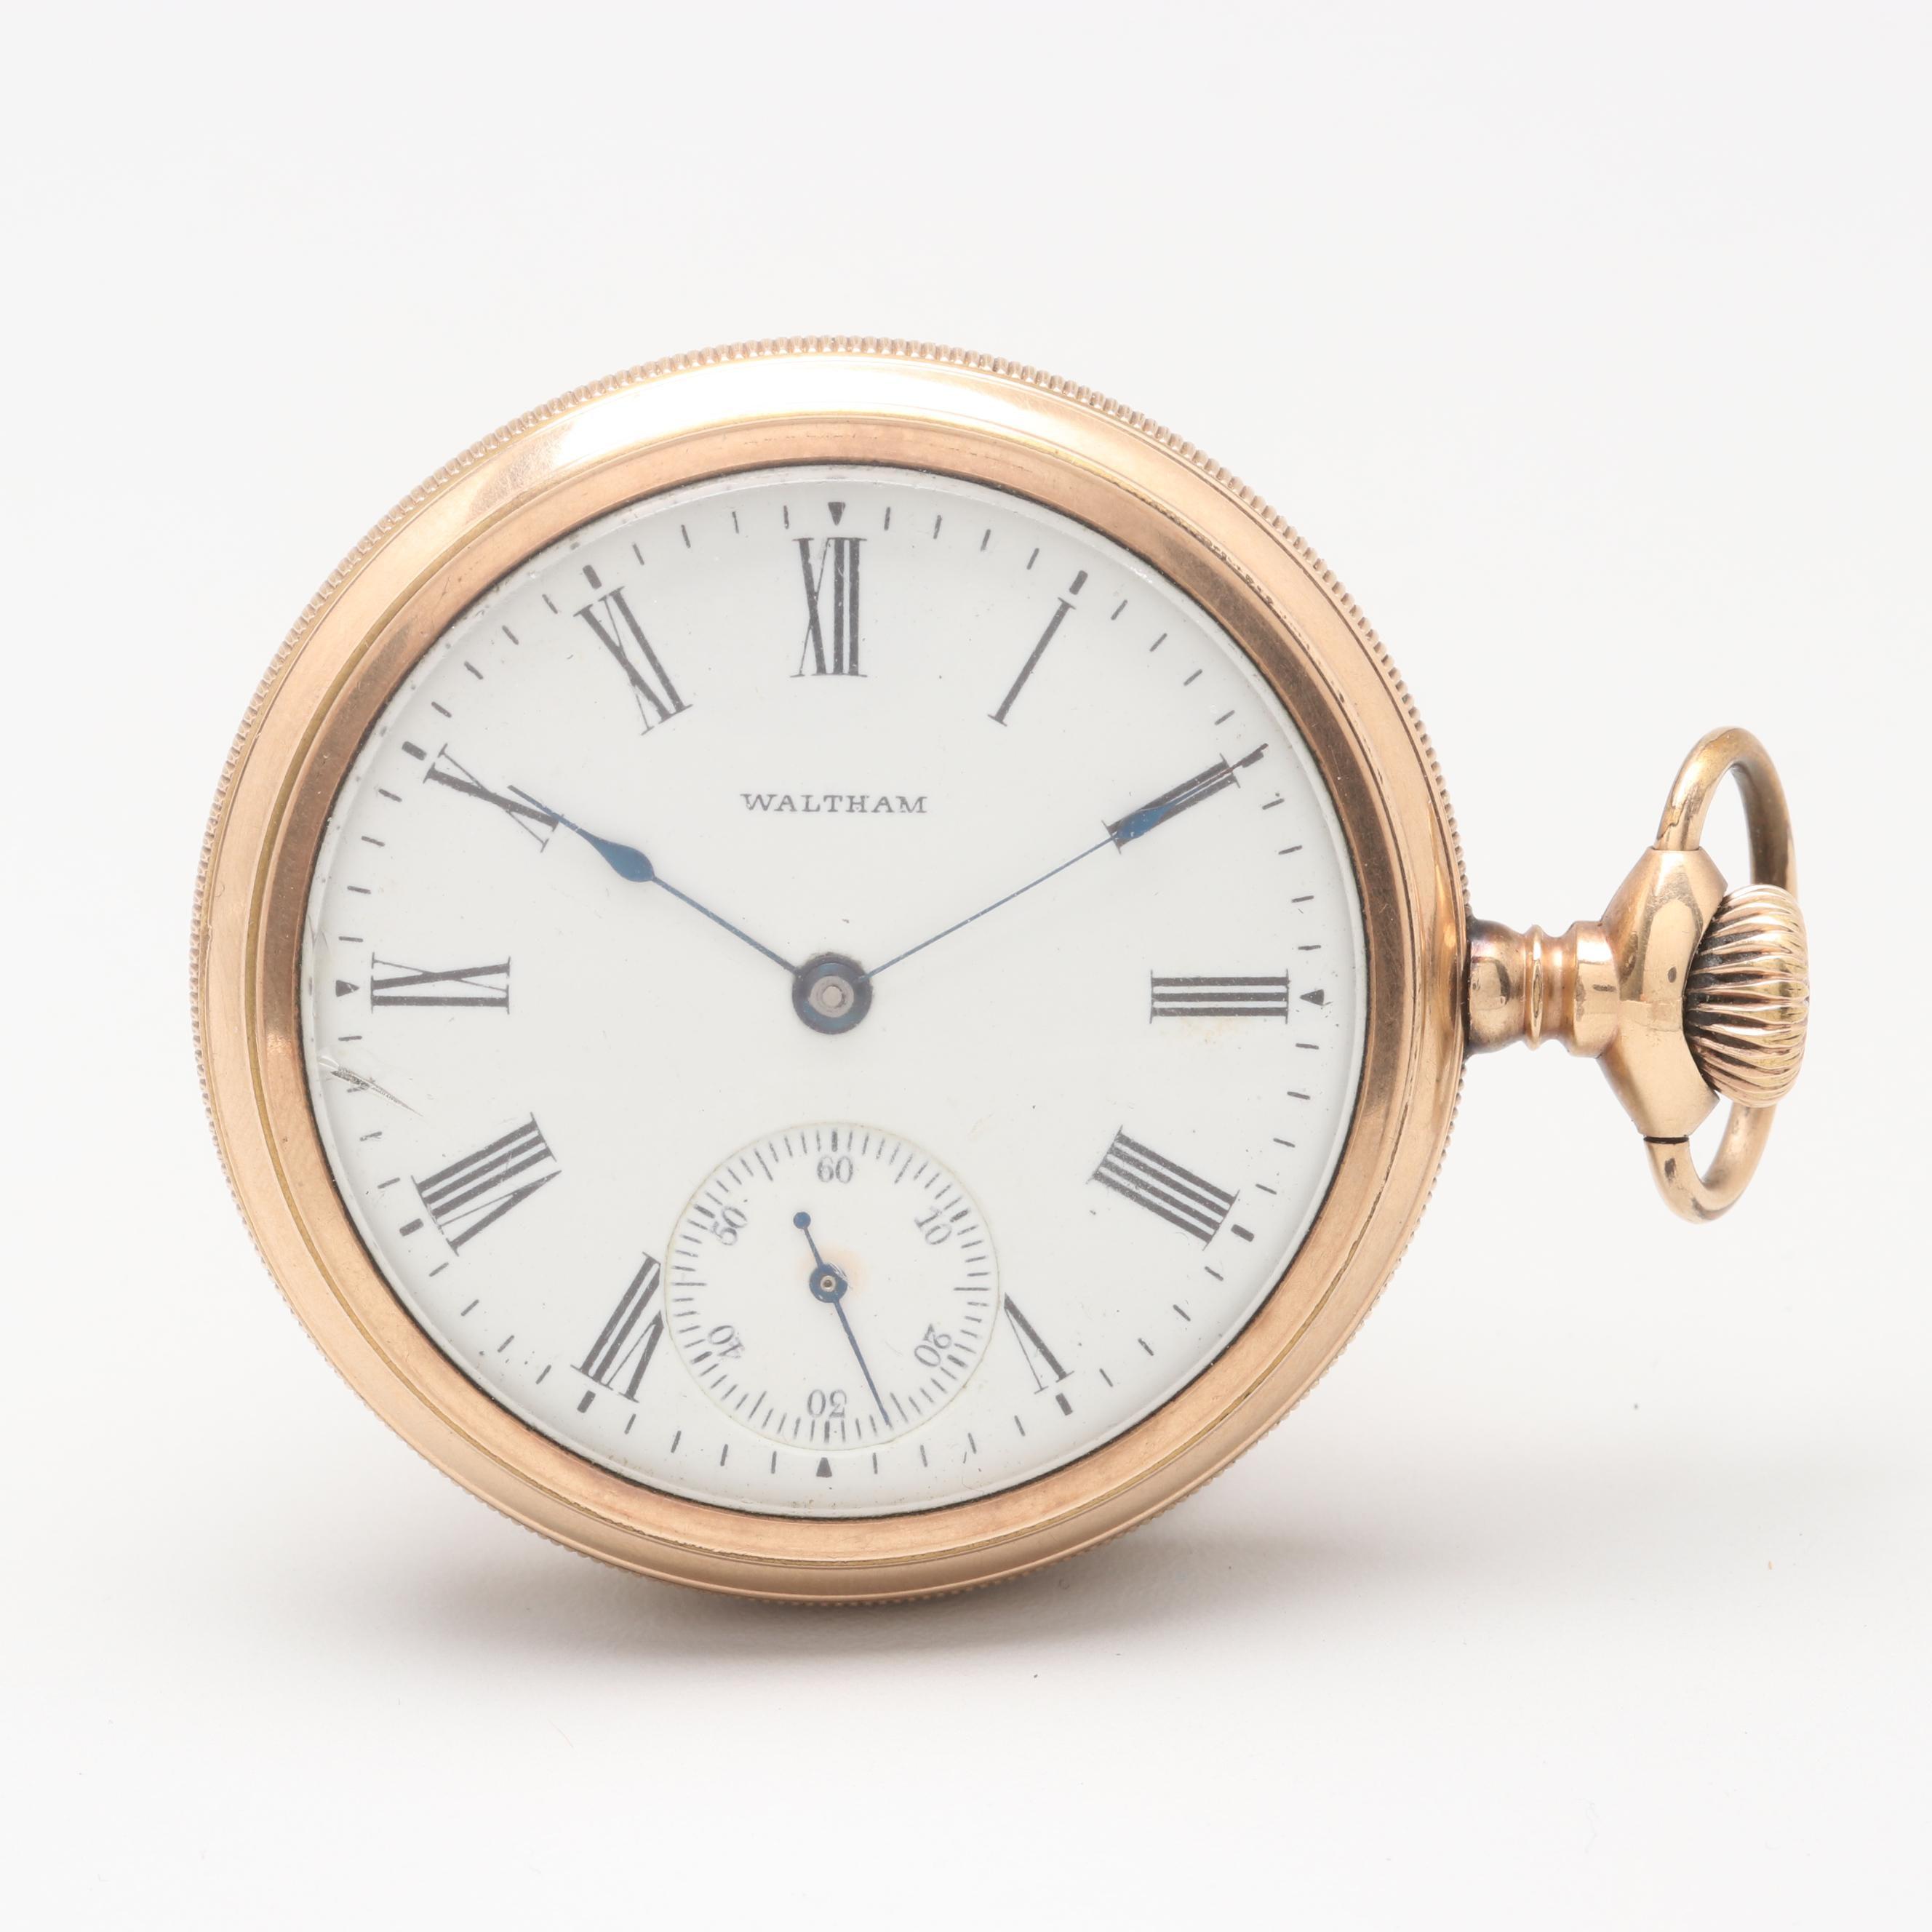 Circa 1902 Waltham Gold Filled Sidewinder Pocket Watch